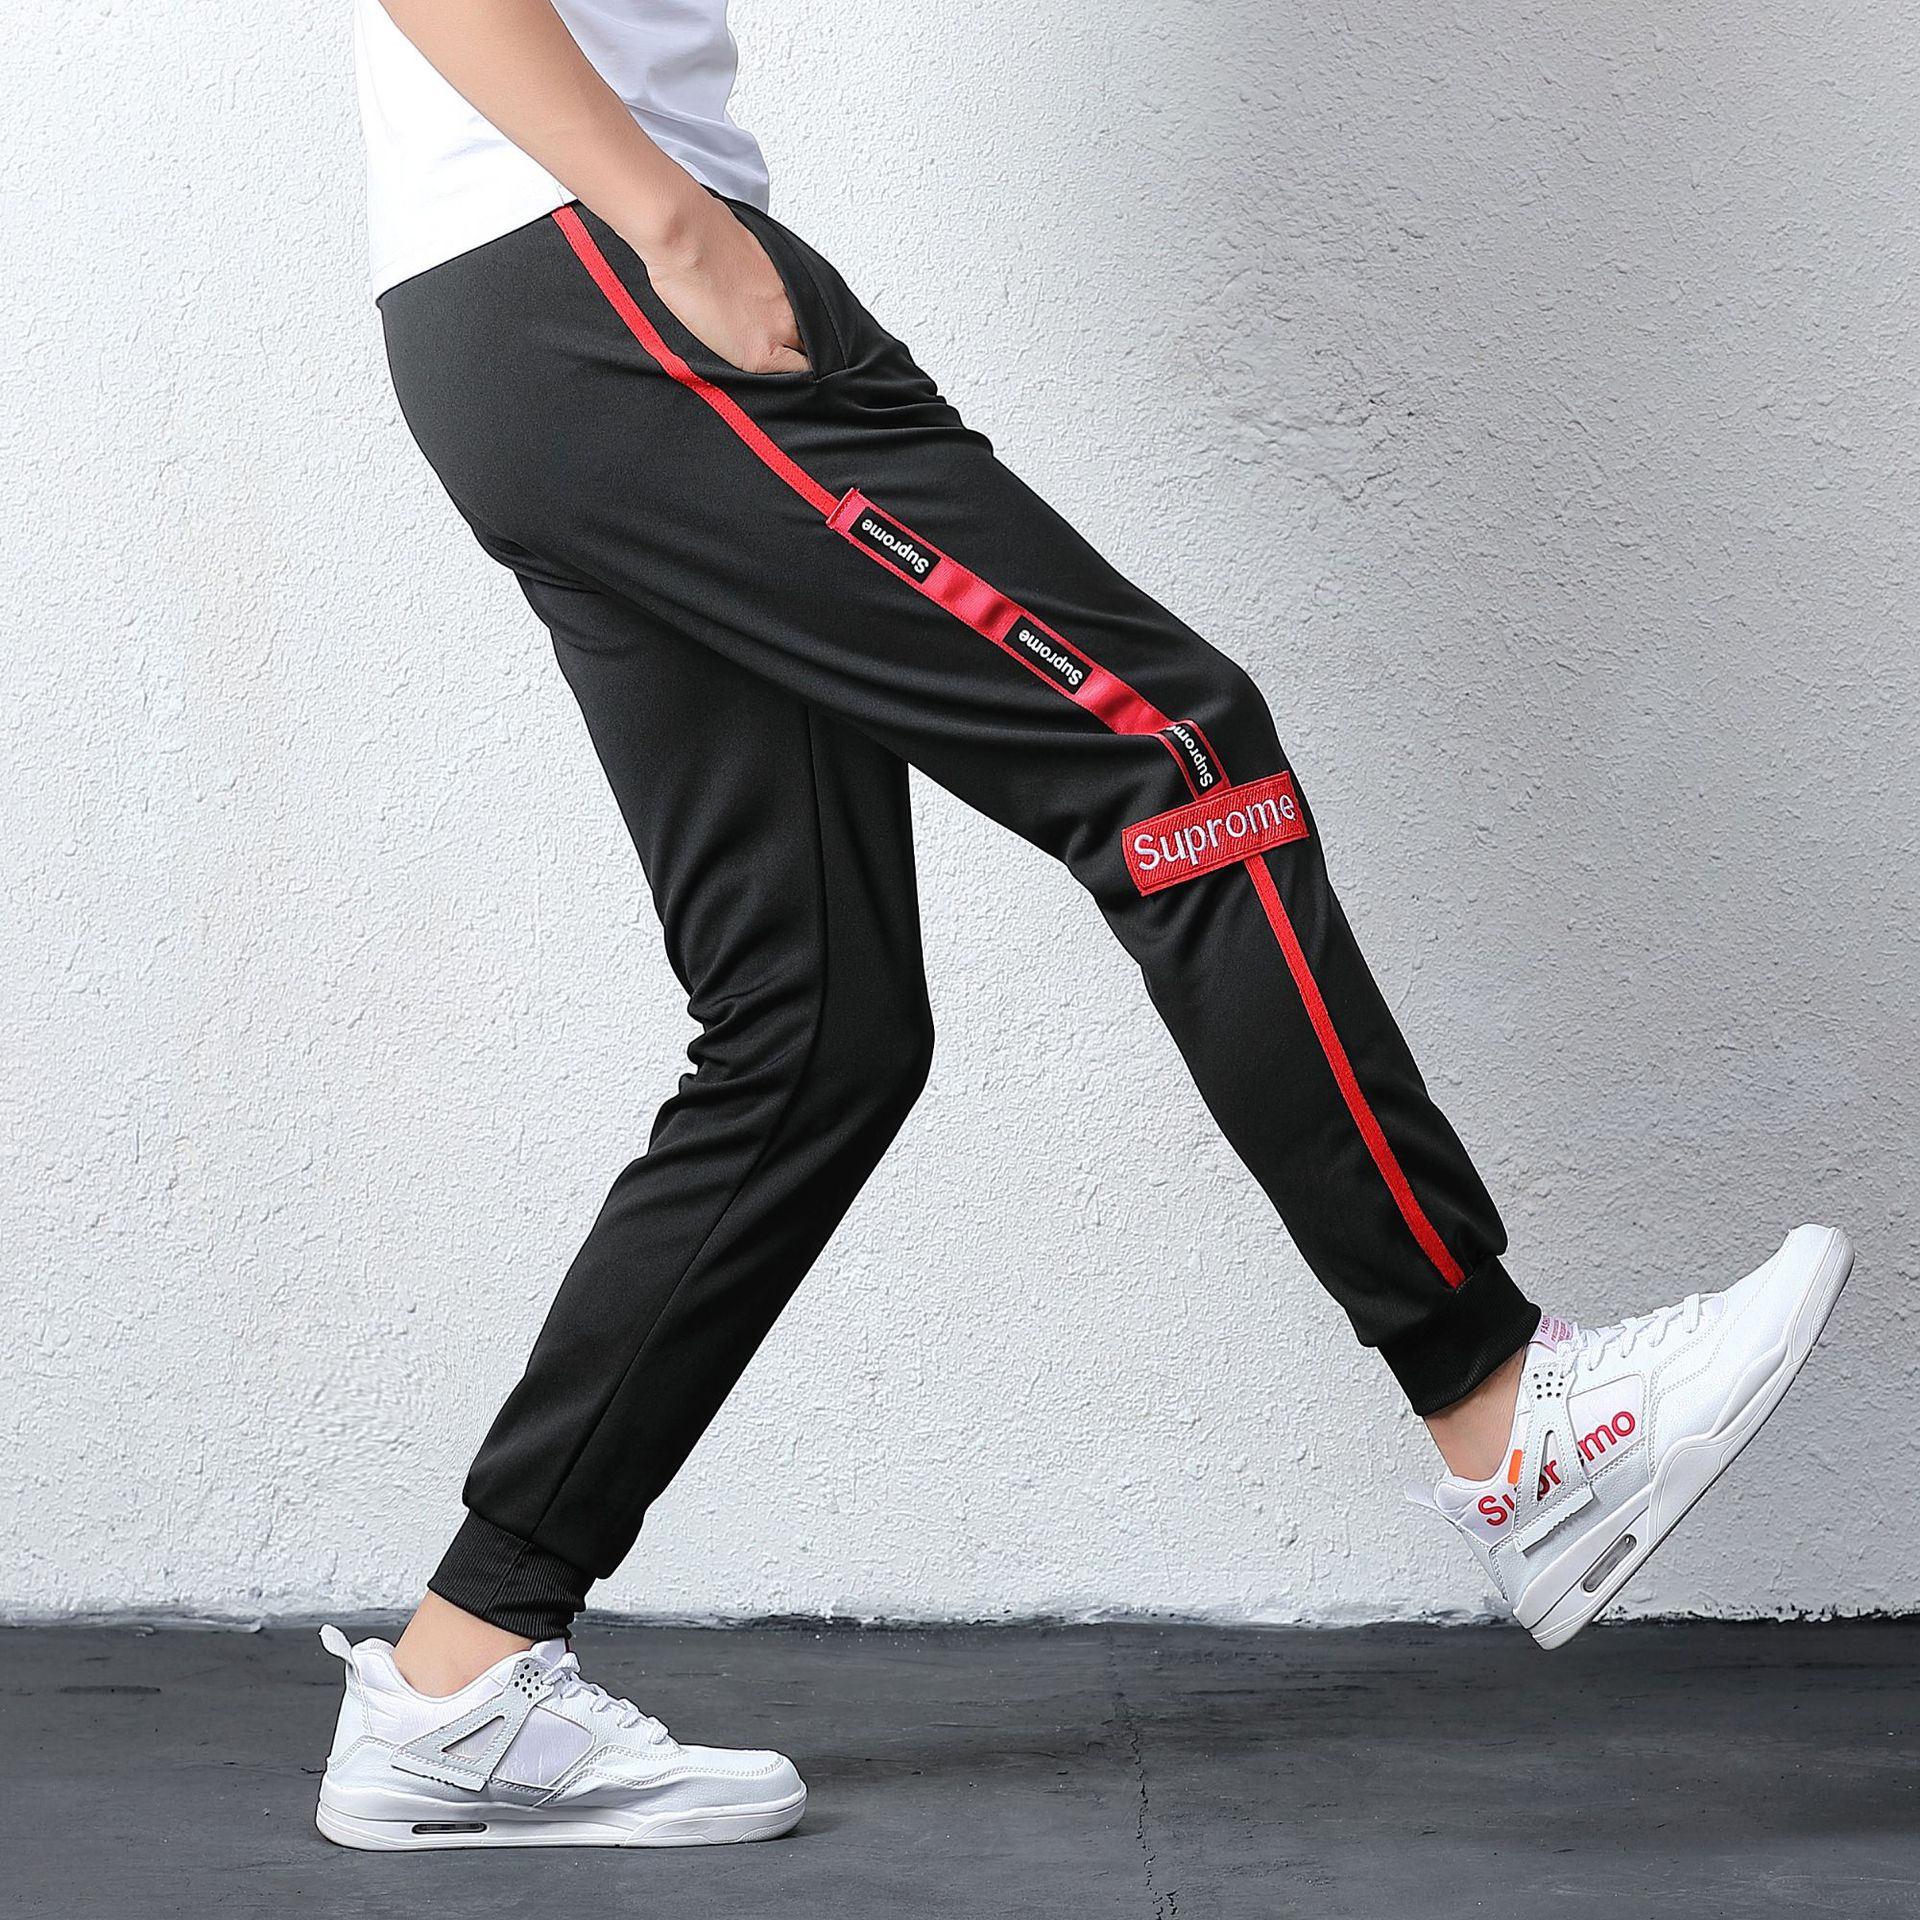 Spring New Style Men Casual Athletic Pants Skinny Harem Long Pants Men's Cool Slim Fit Versatile